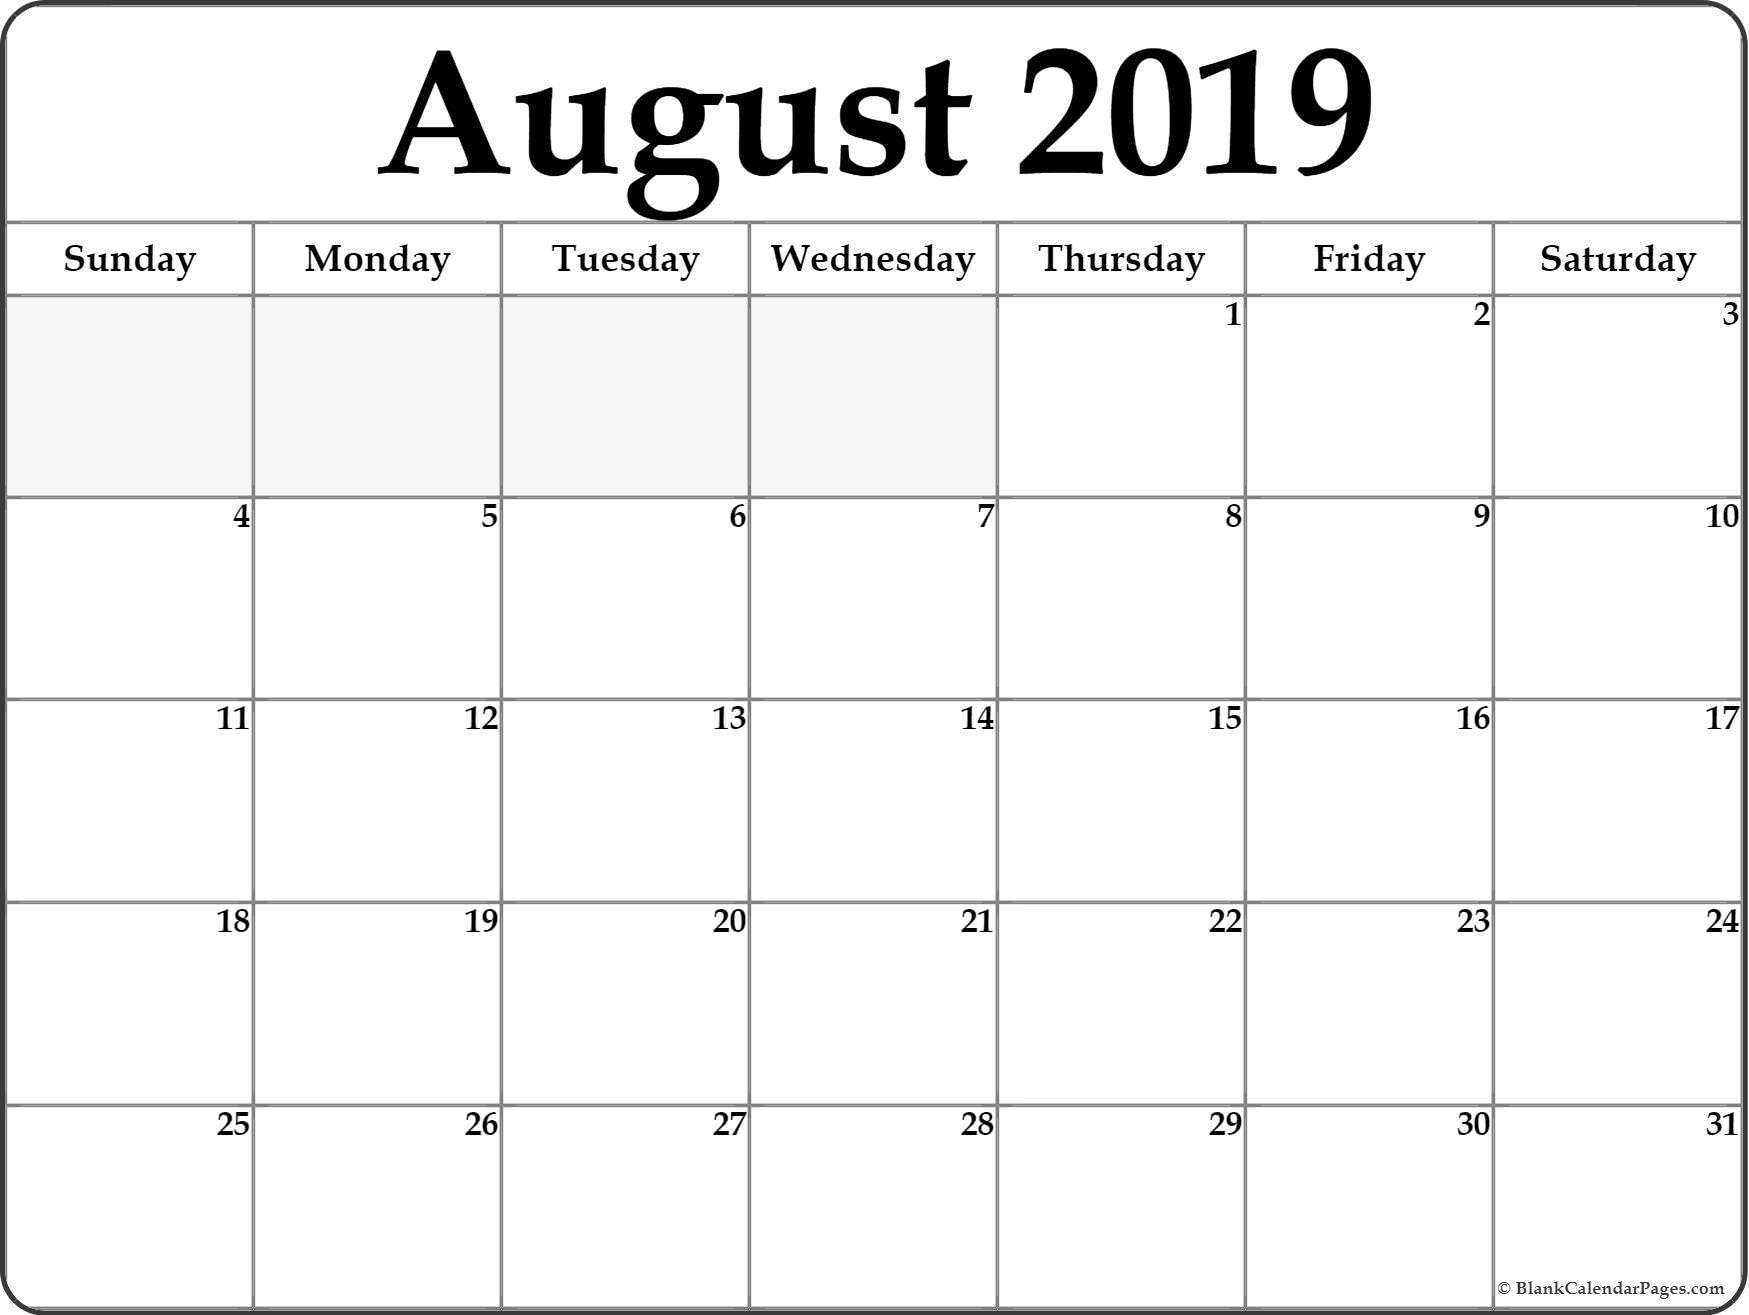 August 2019 Calendar   Free Printable Monthly Calendars within Blank Calendar Aug Printable